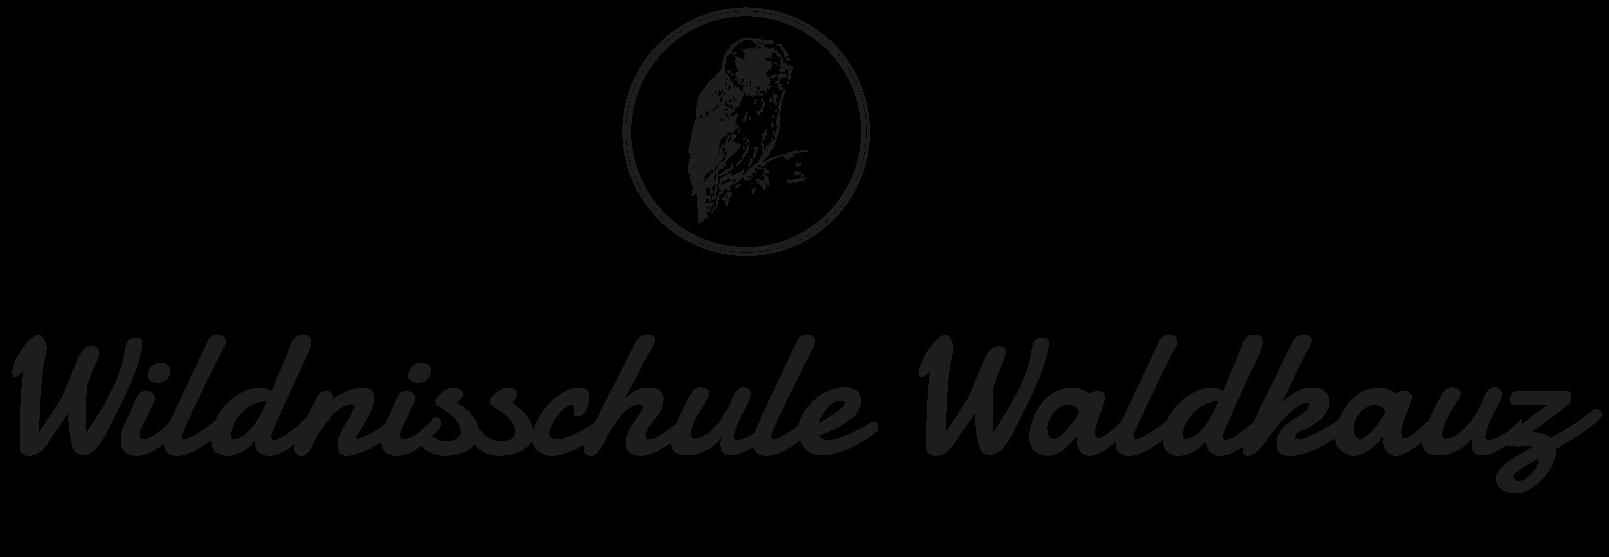 Wildnisschule Waldkauz